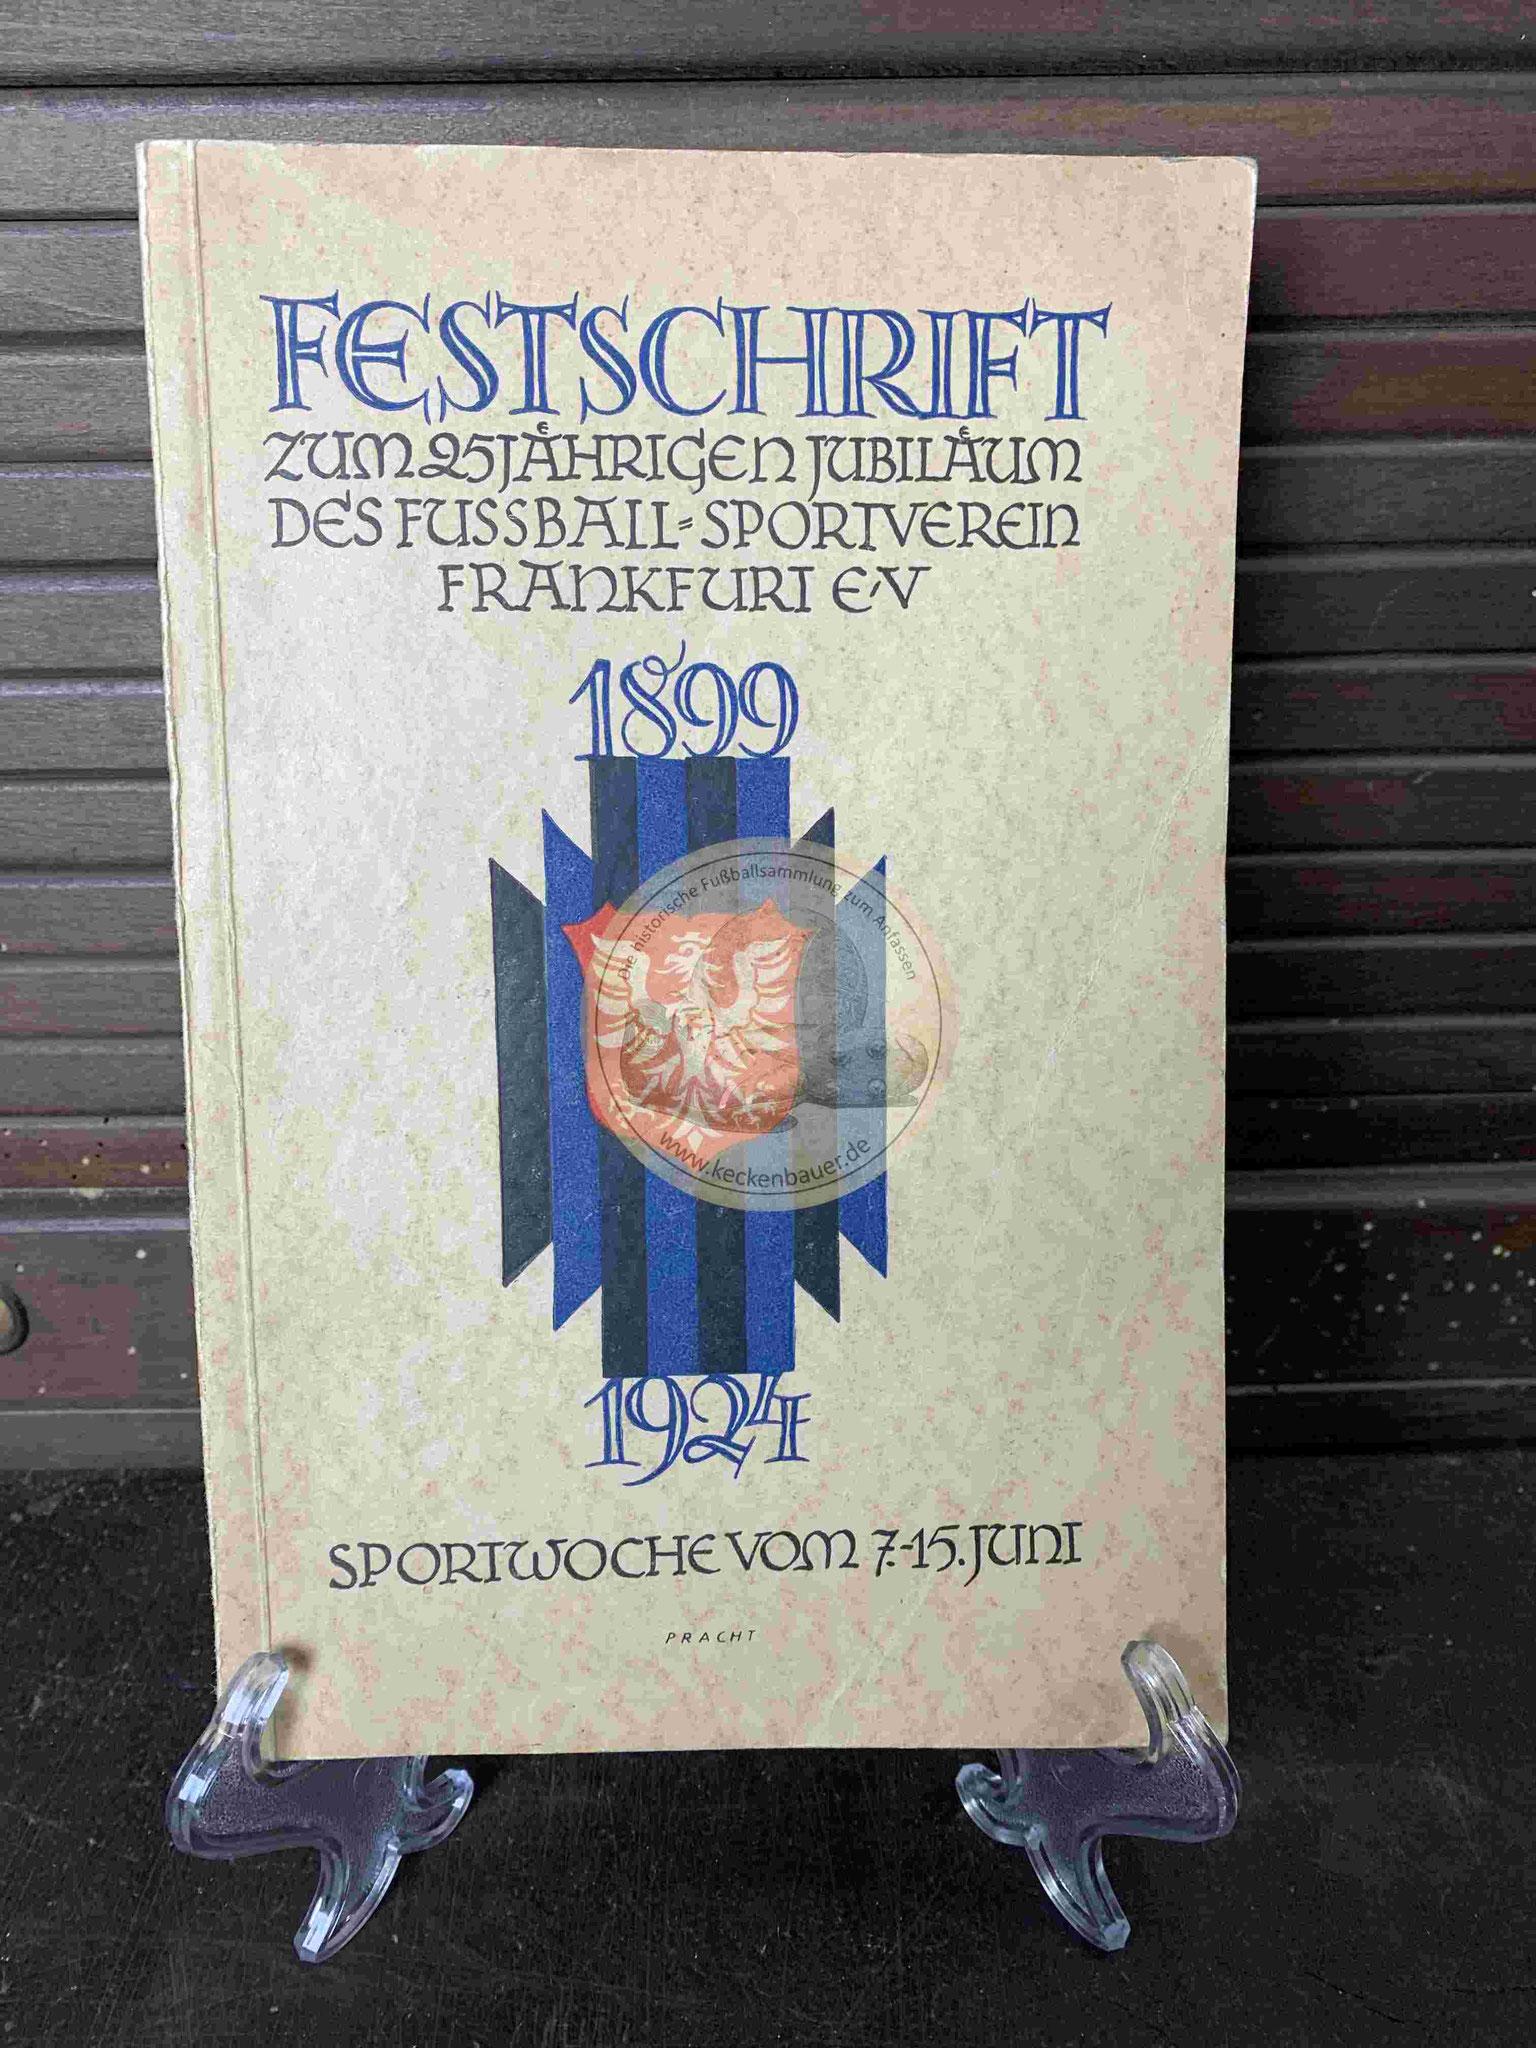 Festschrift zum 25 jährigem Jubiläum Fussball Sportverein Frankfurt e.V. aus dem Jahr 1924